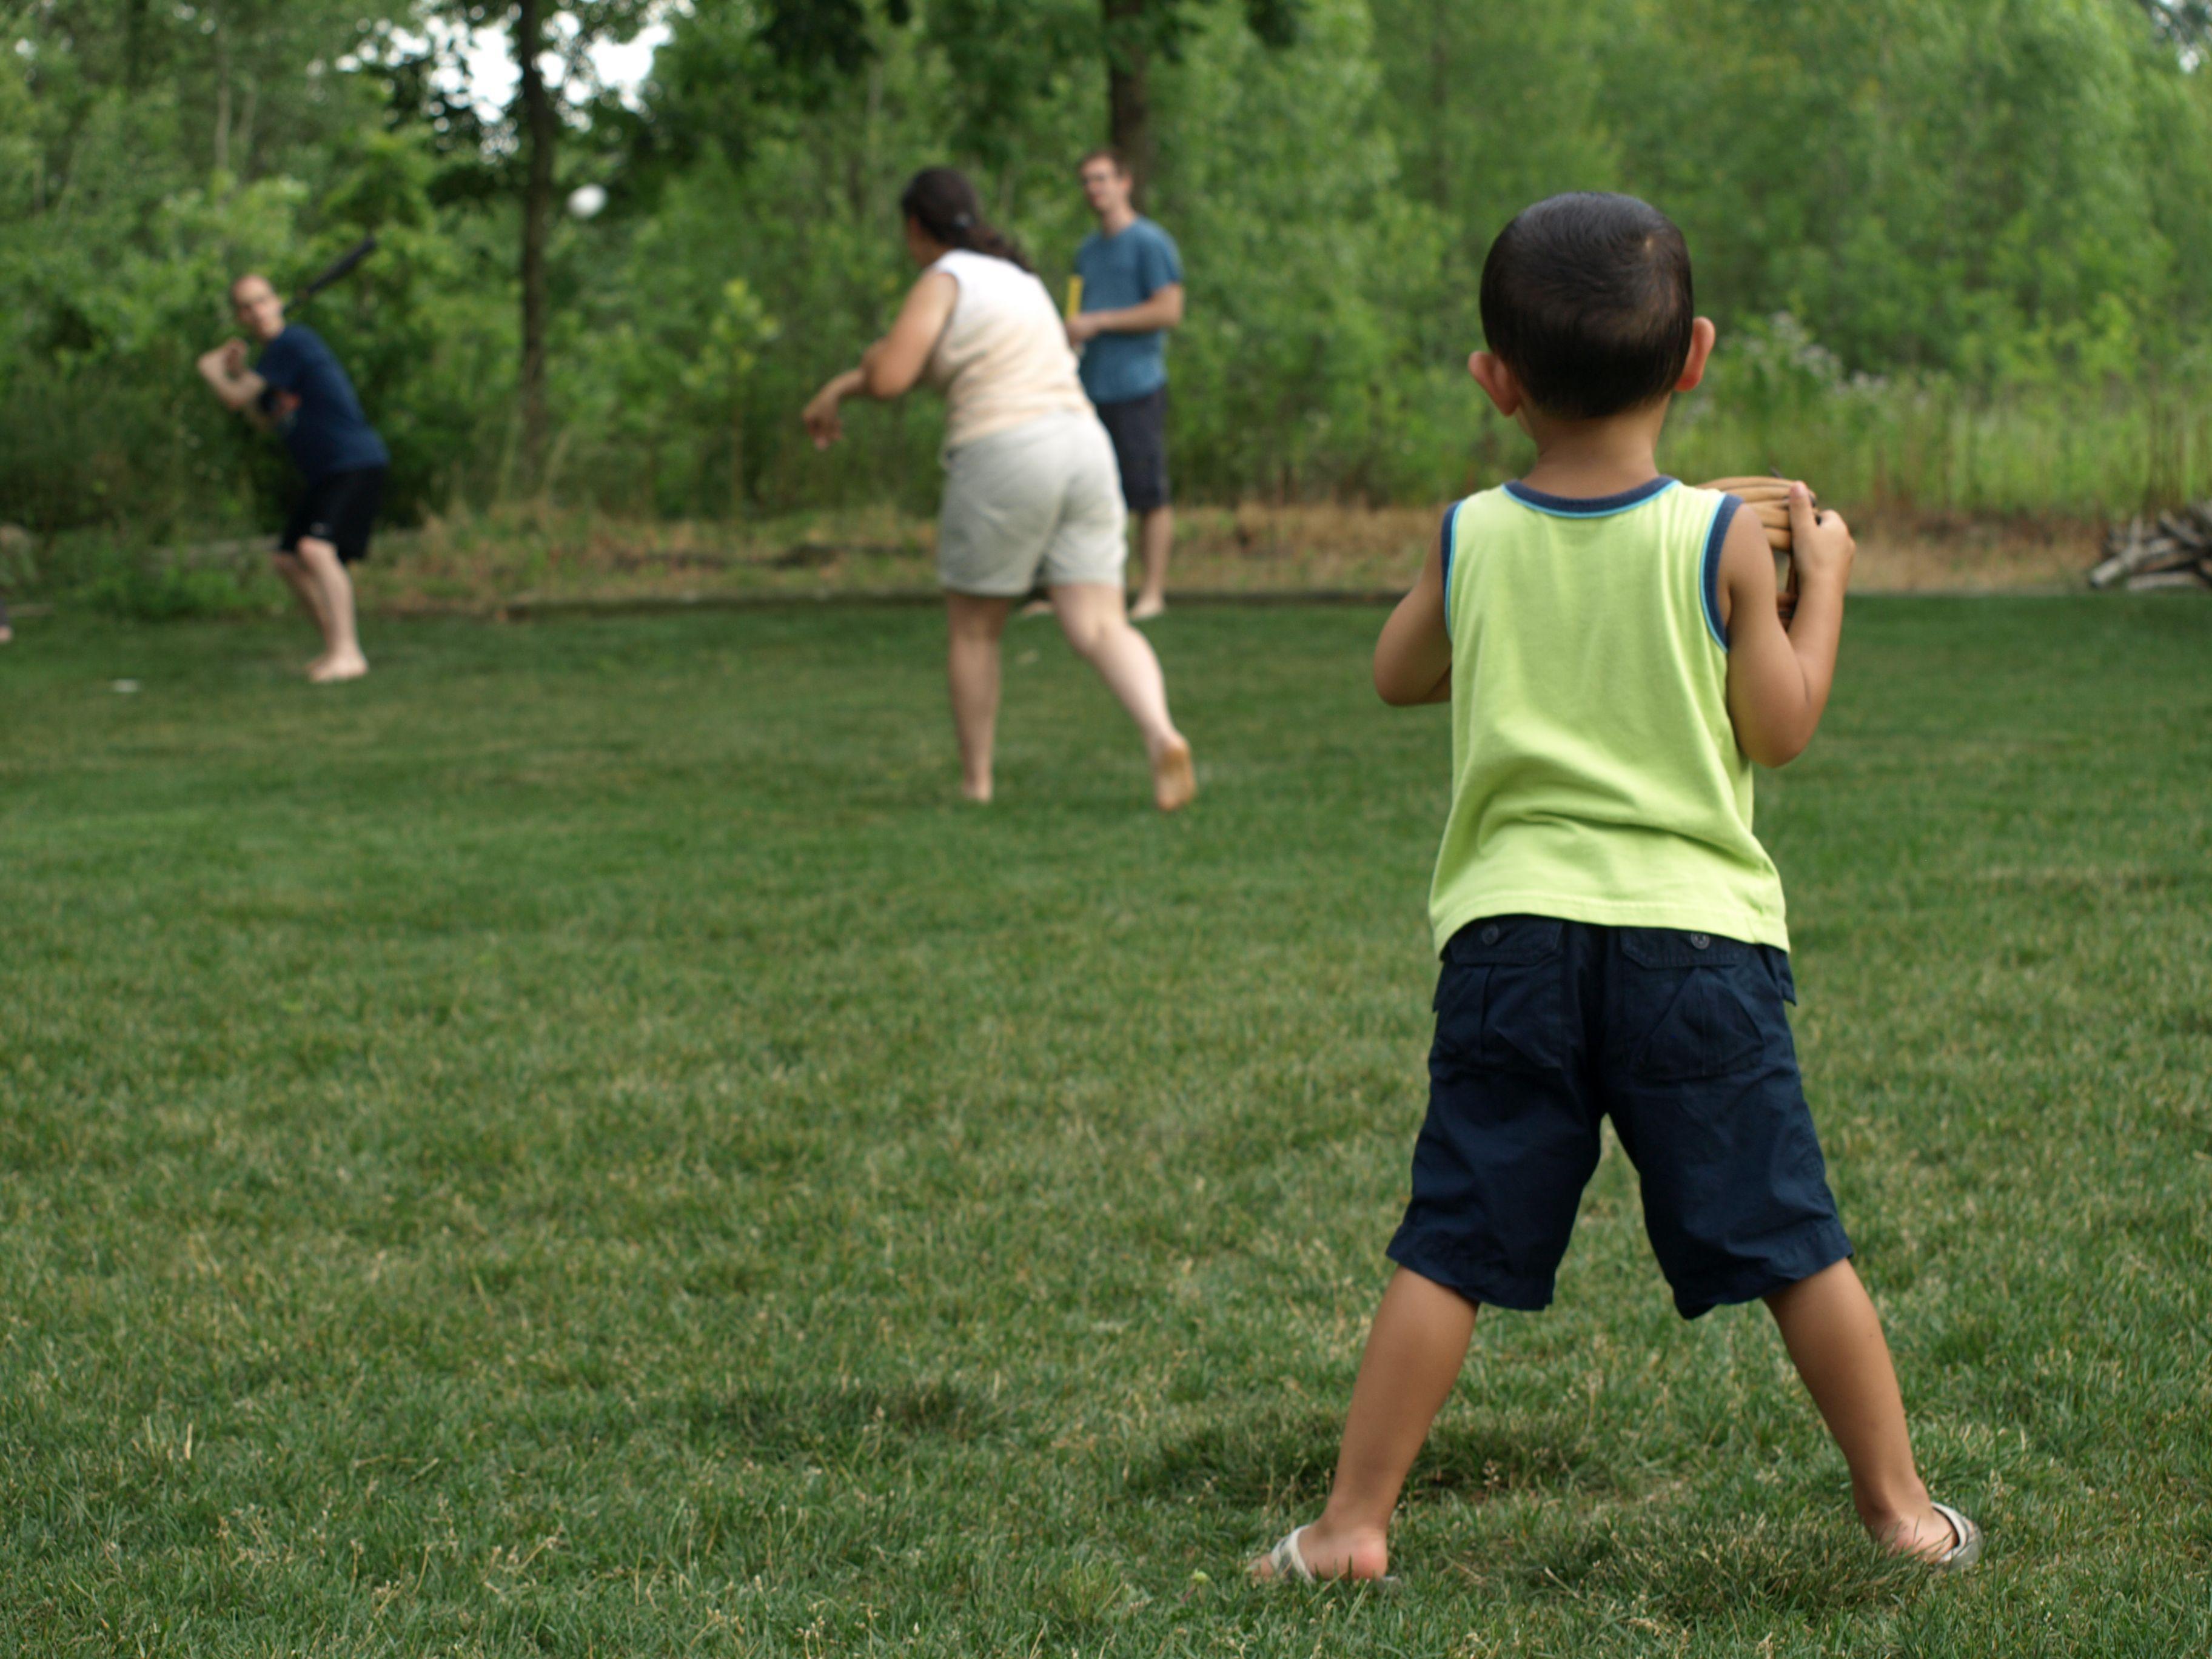 backyard baseball sports children playing family bbq picnic